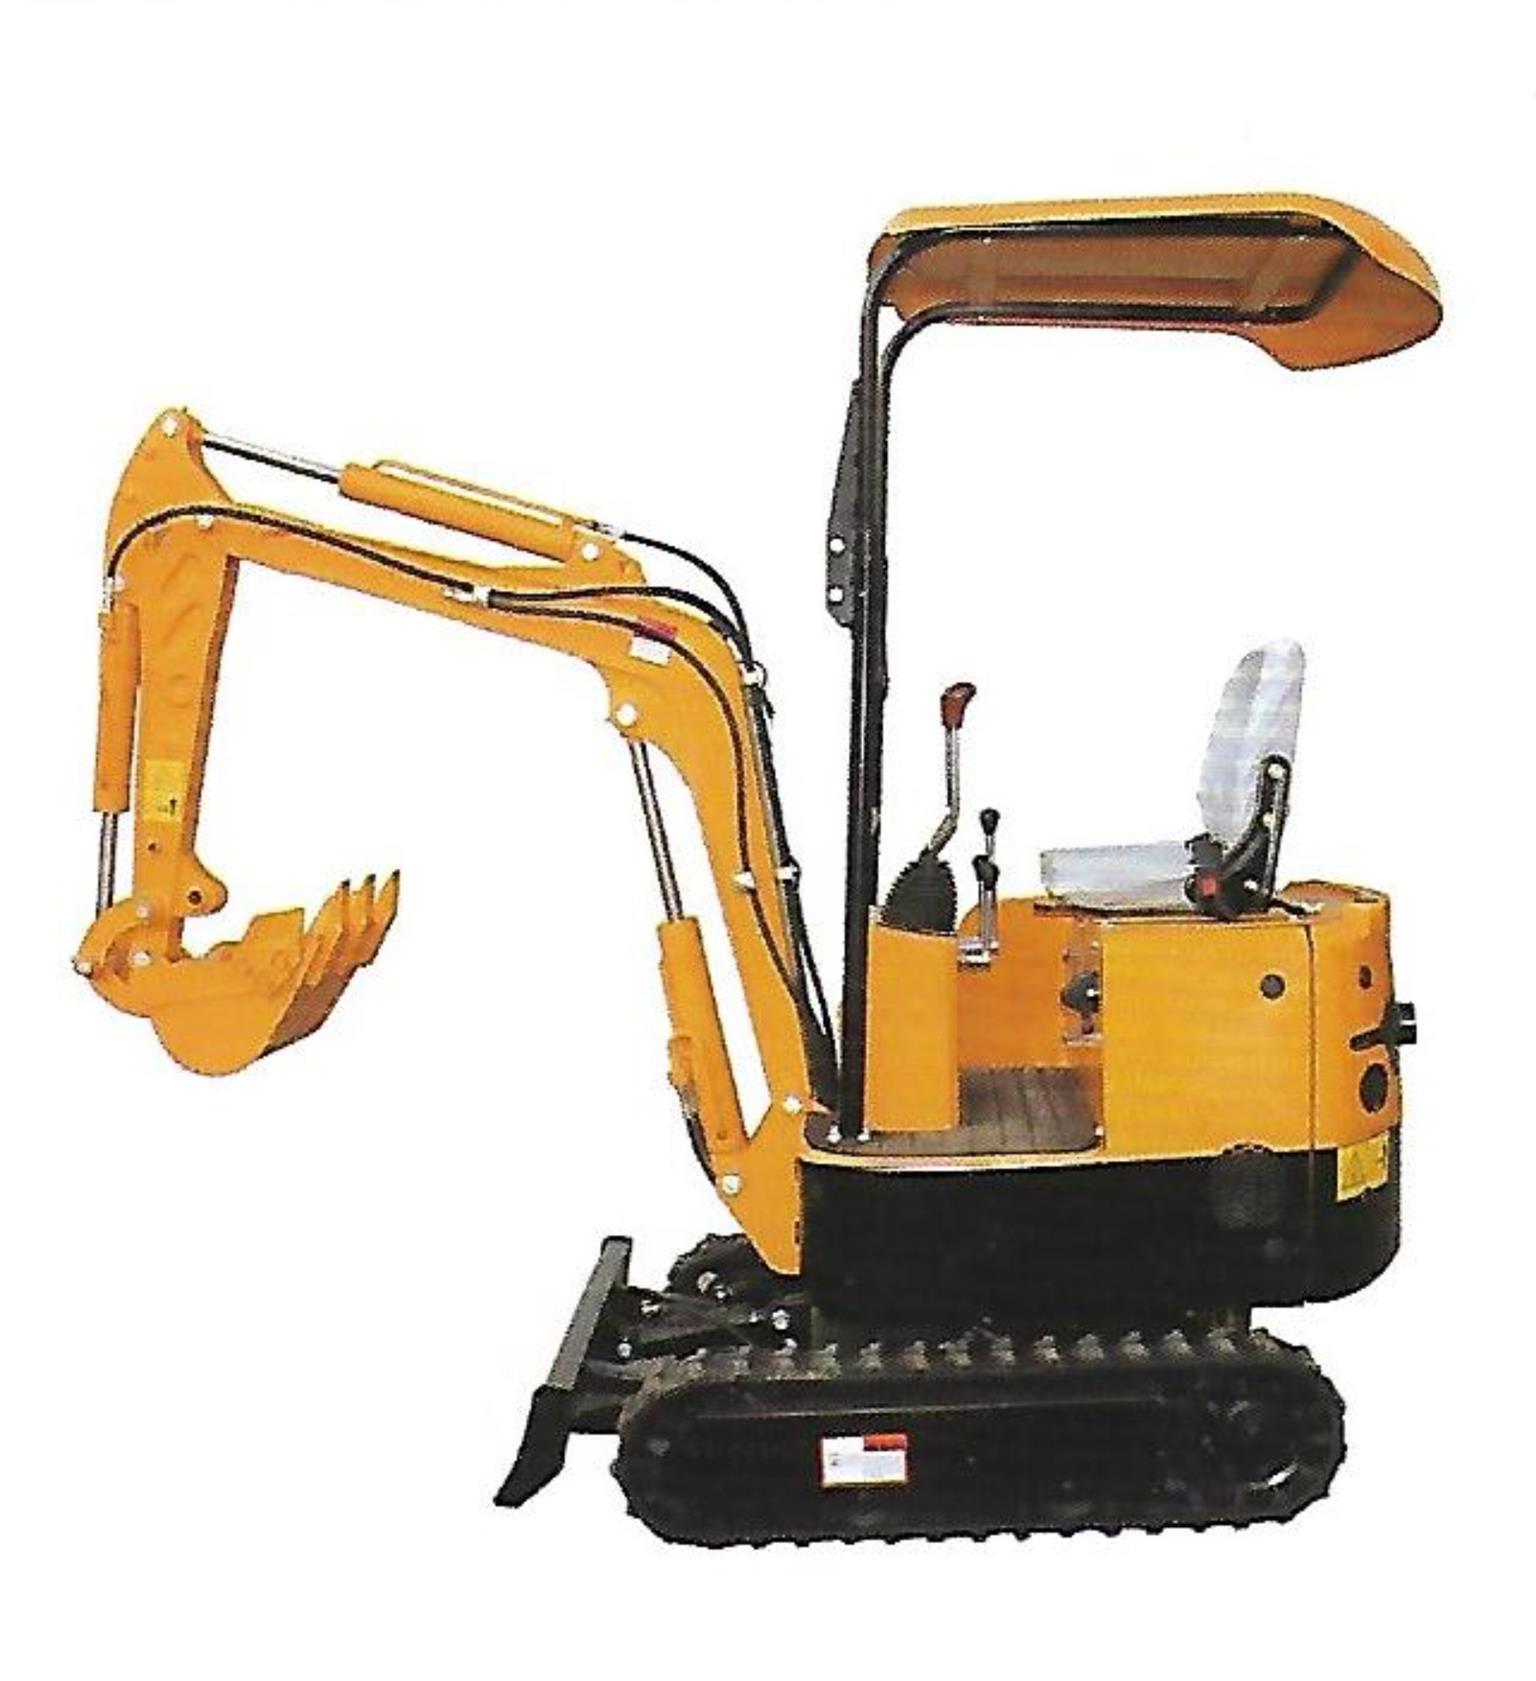 Minni Excavator